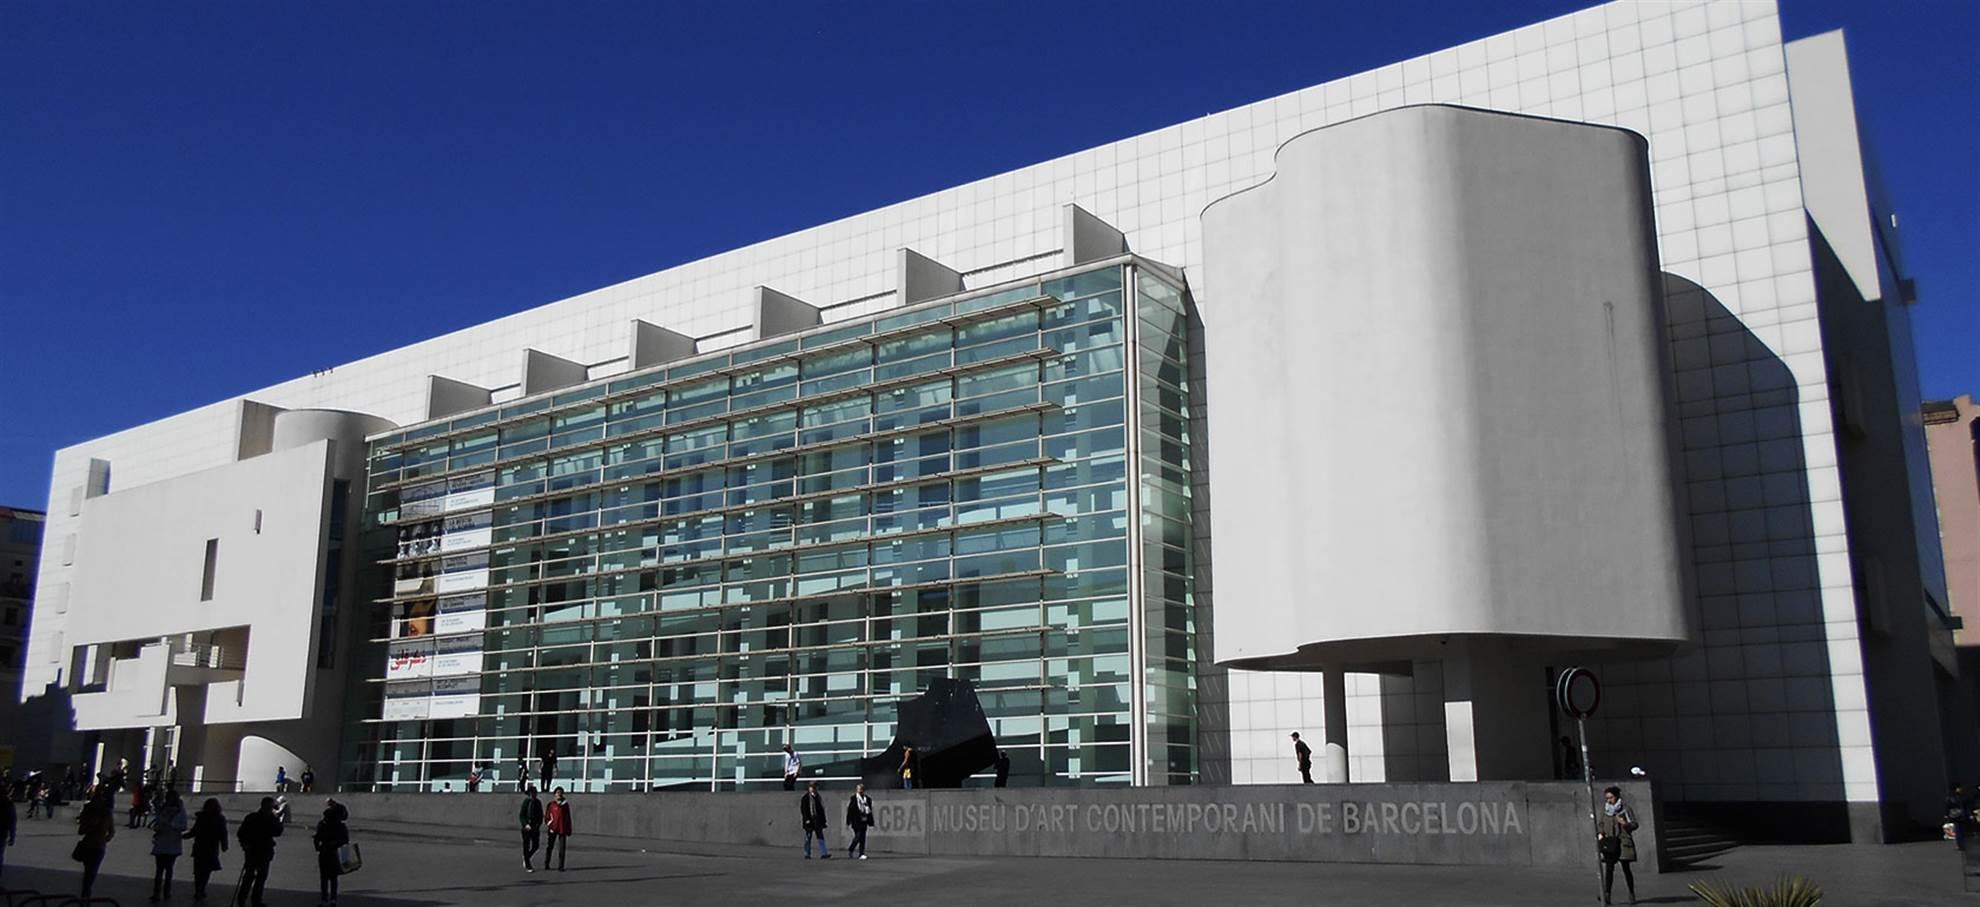 Barcelona Museum of Contemporary Art Tickets